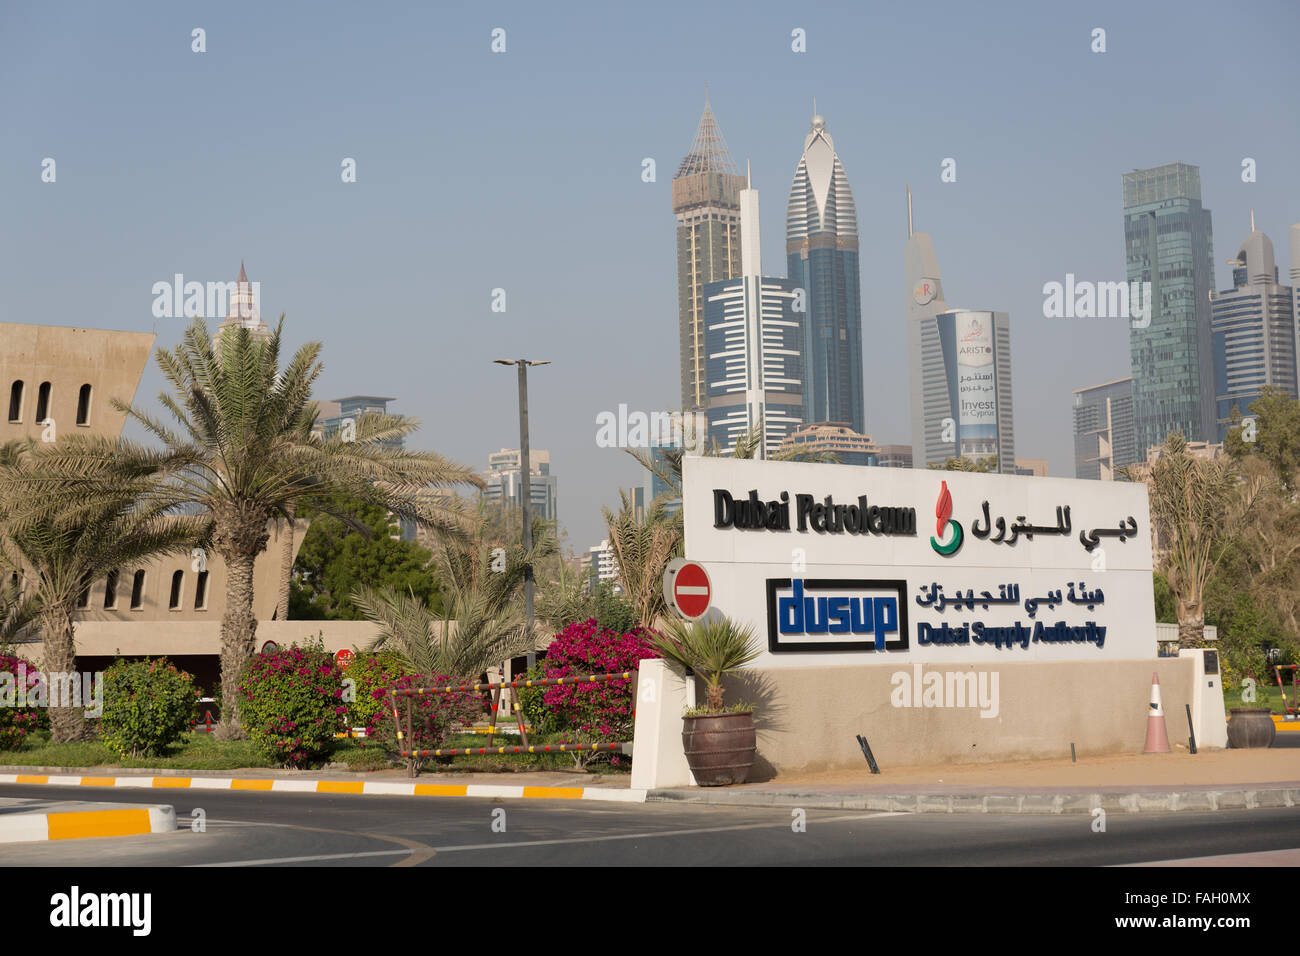 Dubai Petroleum office, Dubai UAE Stock Photo, Royalty Free Image ...